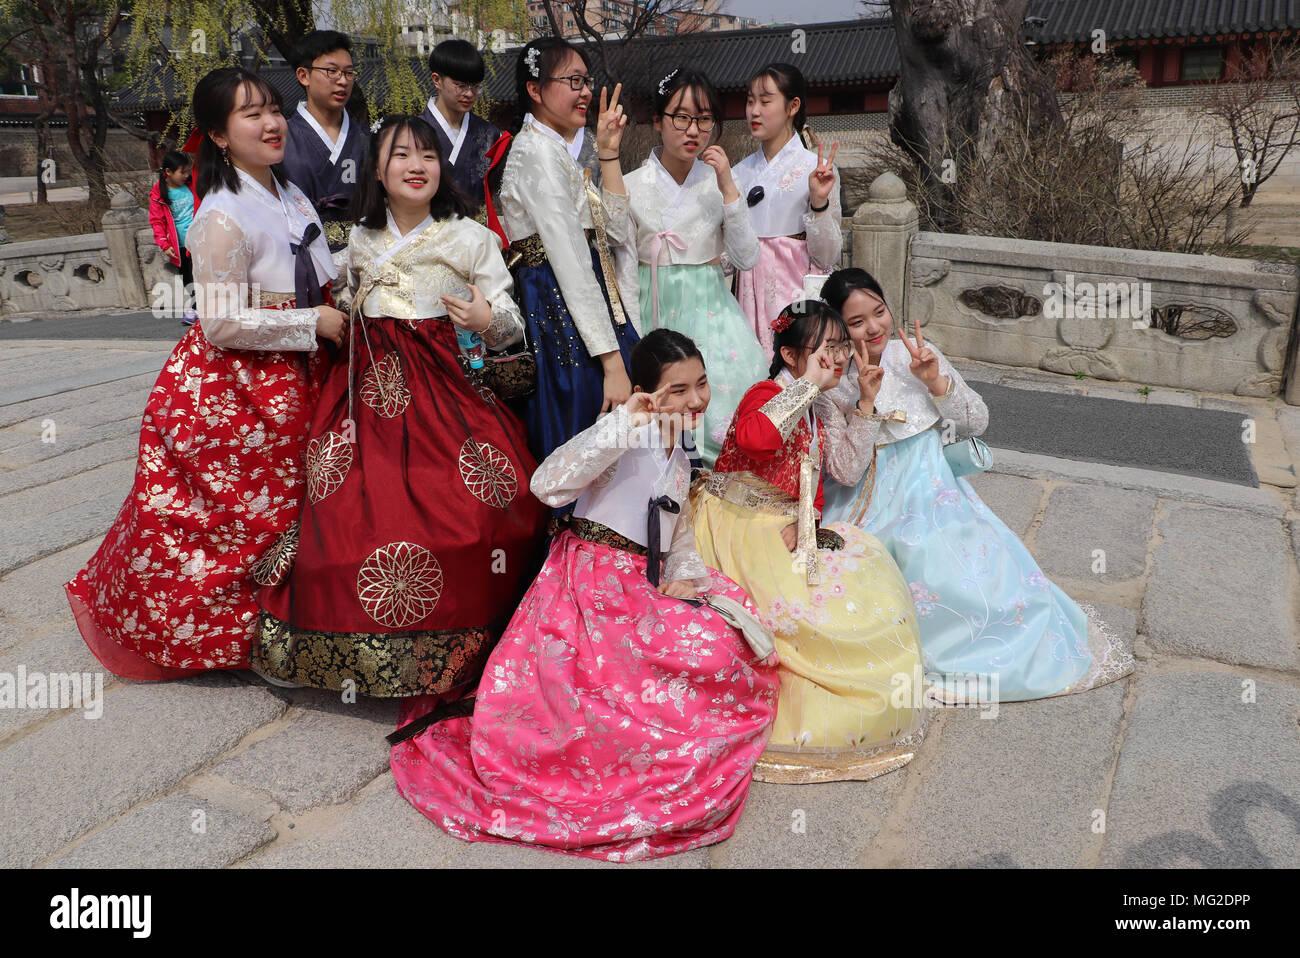 c42ebad756d2f Traditional Hanbok Clothing Stock Photos & Traditional Hanbok ...